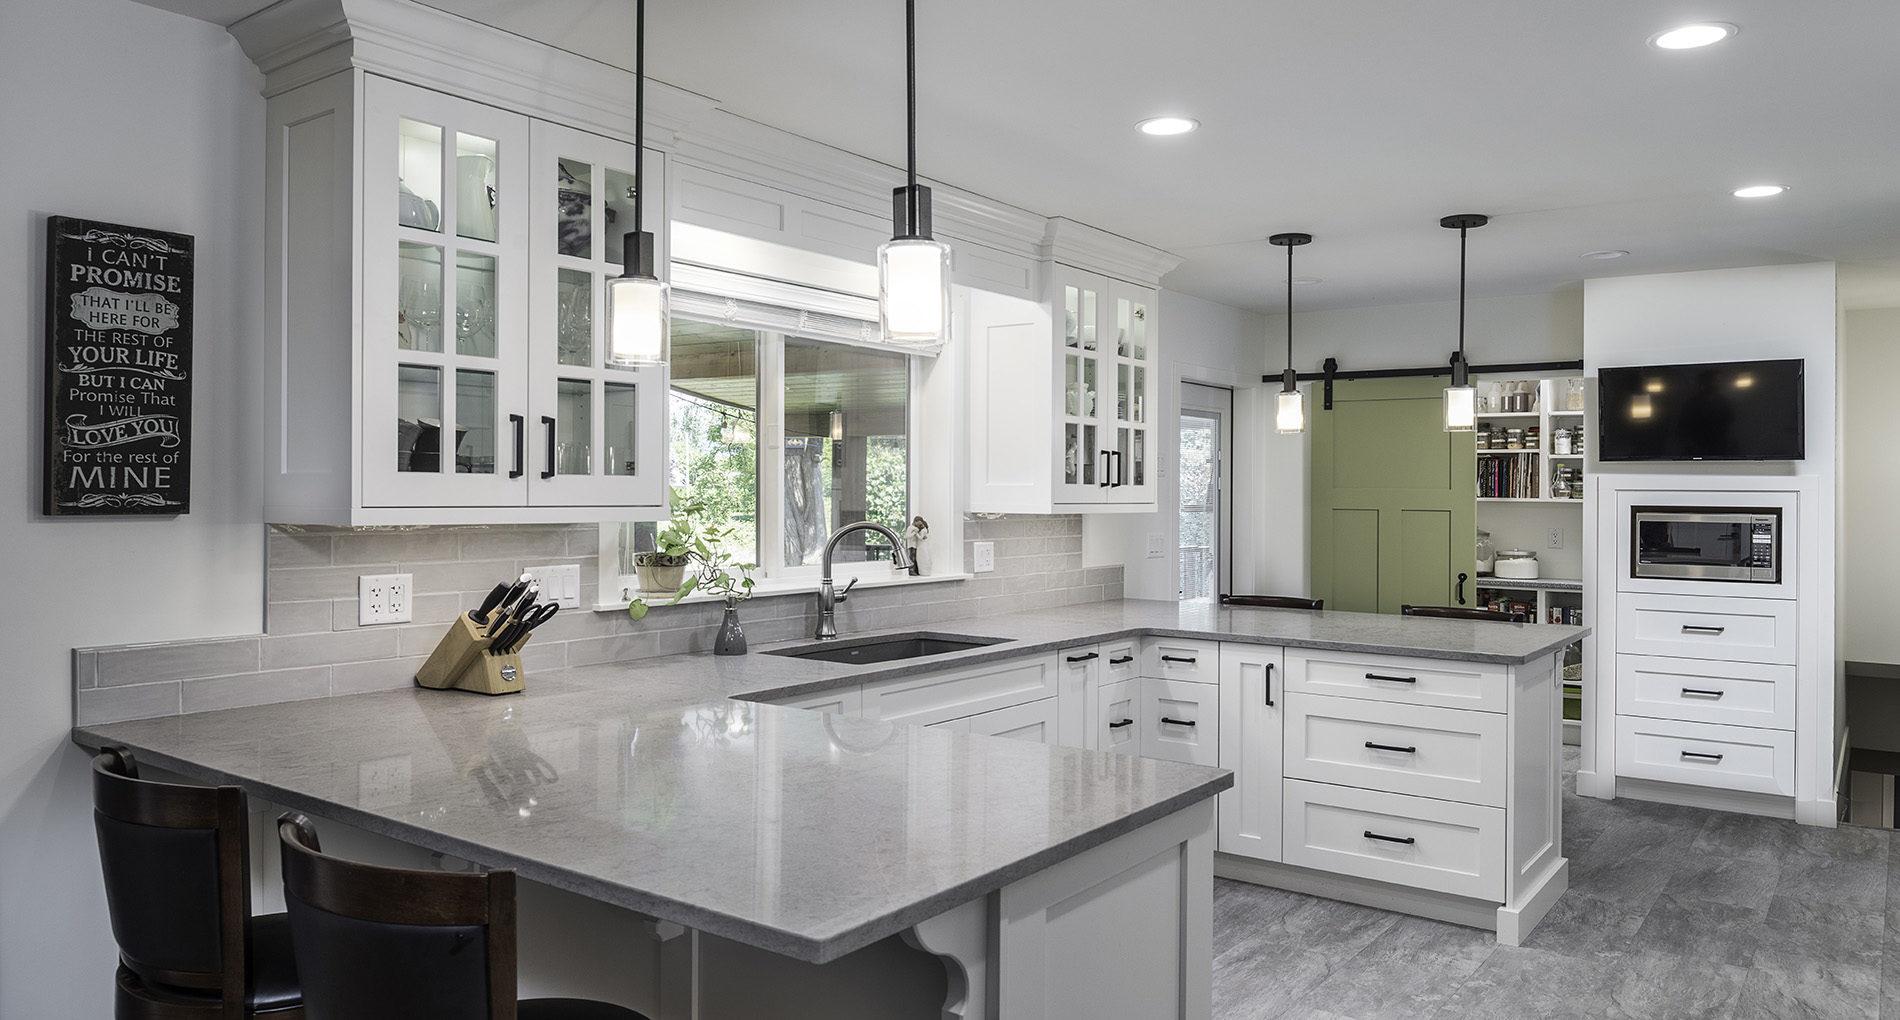 Kitchen Renovations & Design in Chilliwack | Alair Homes ...